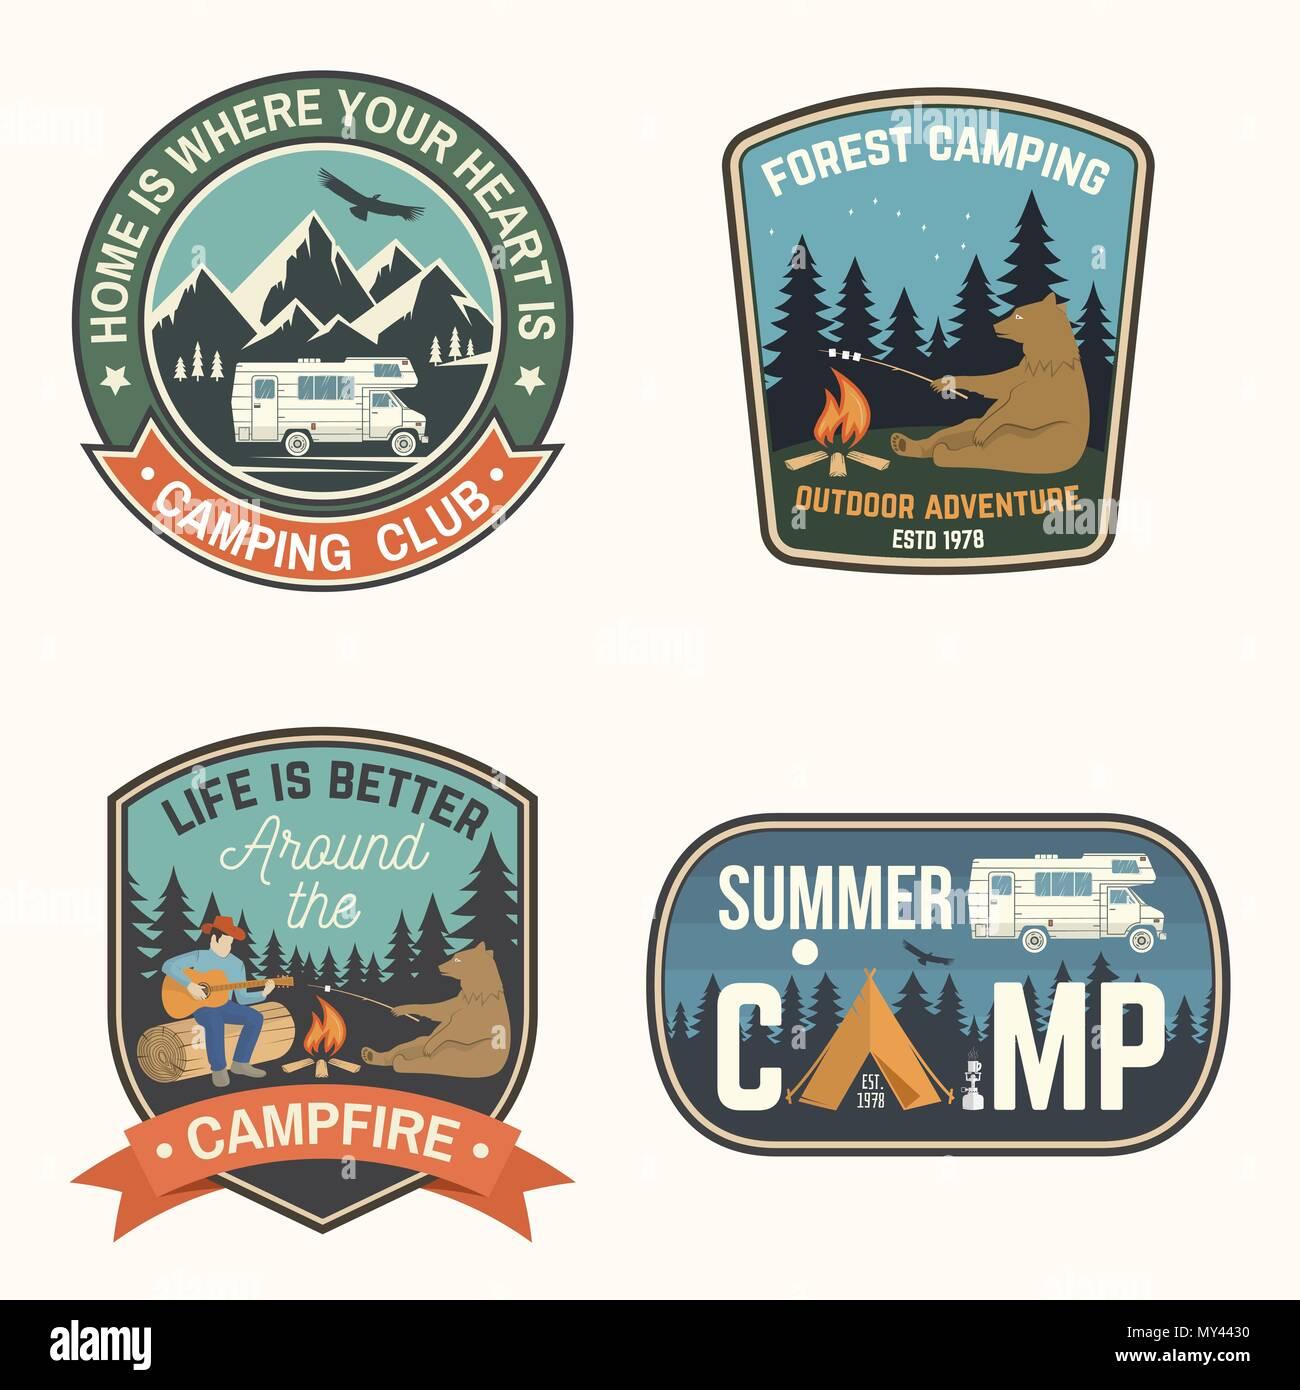 18006e61755a Summer camp. Vector illustration. Concept for shirt or logo